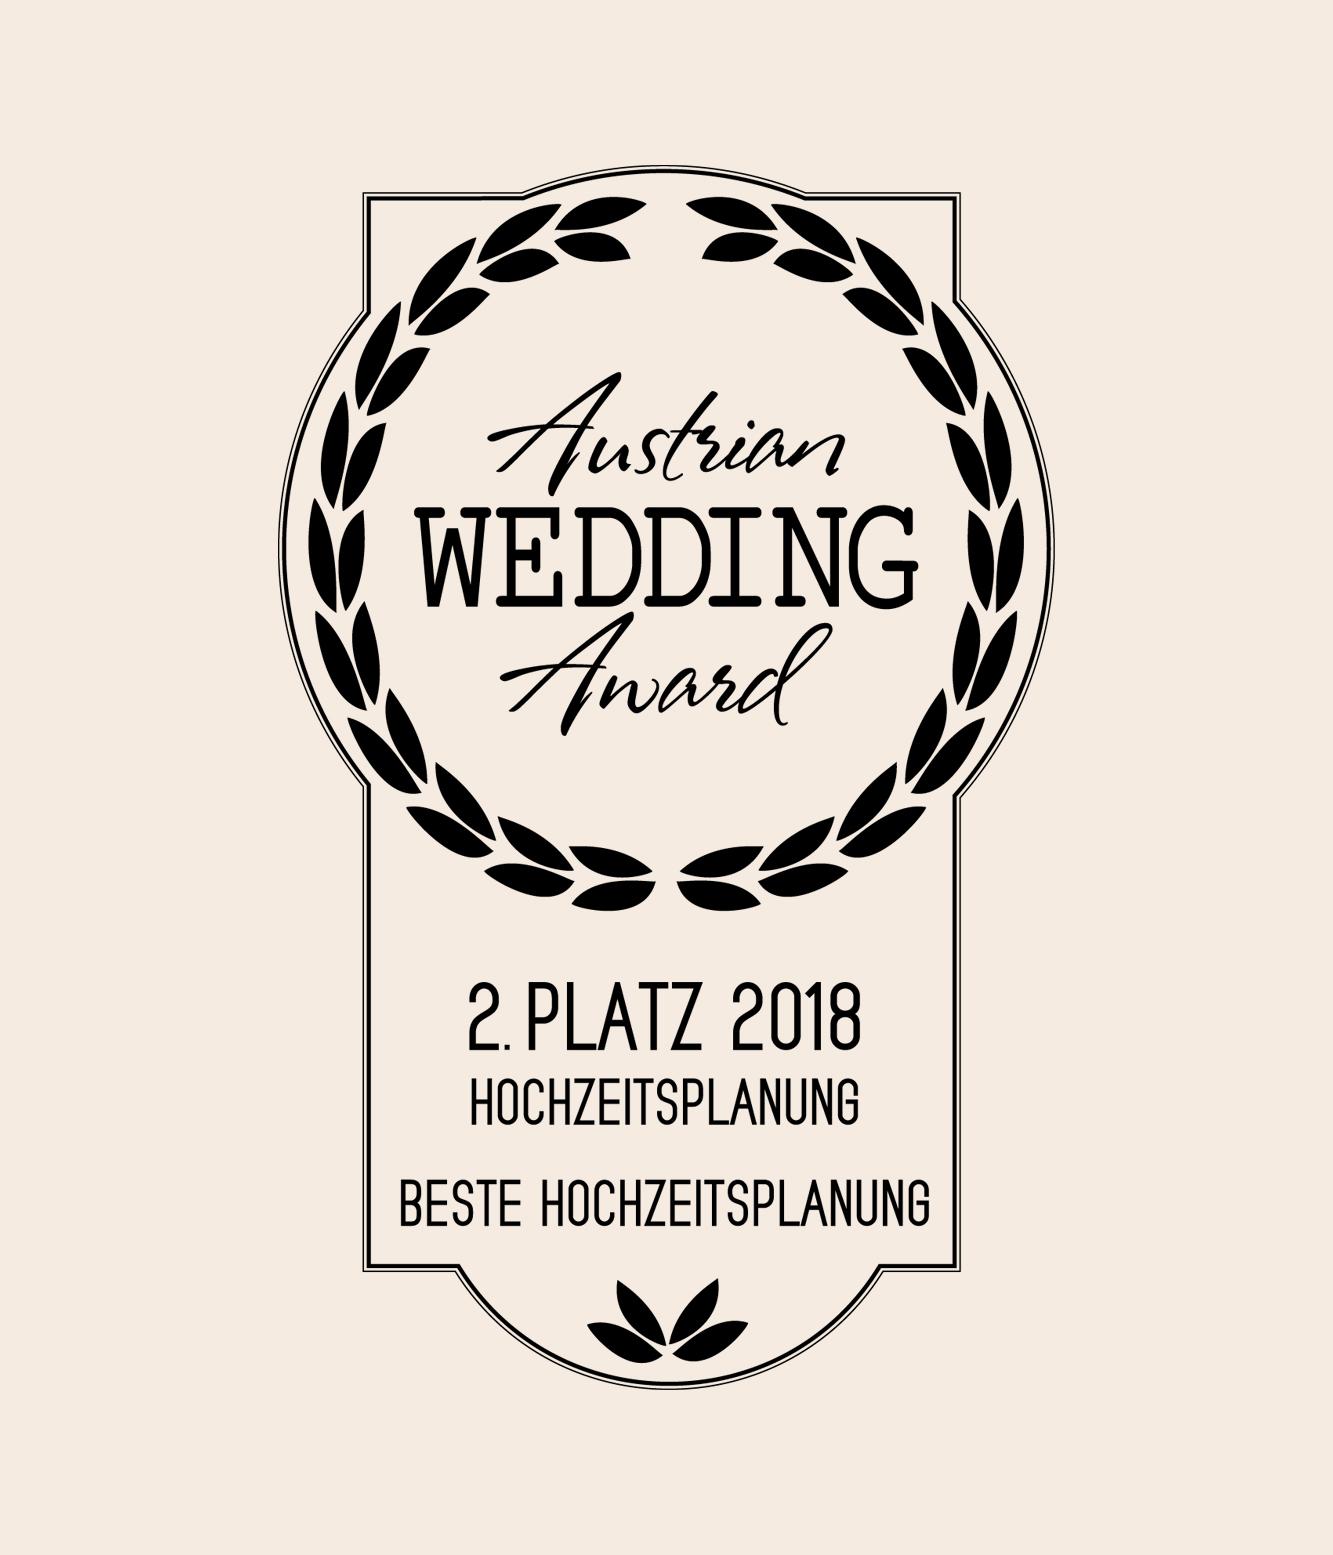 WeddingAward2018